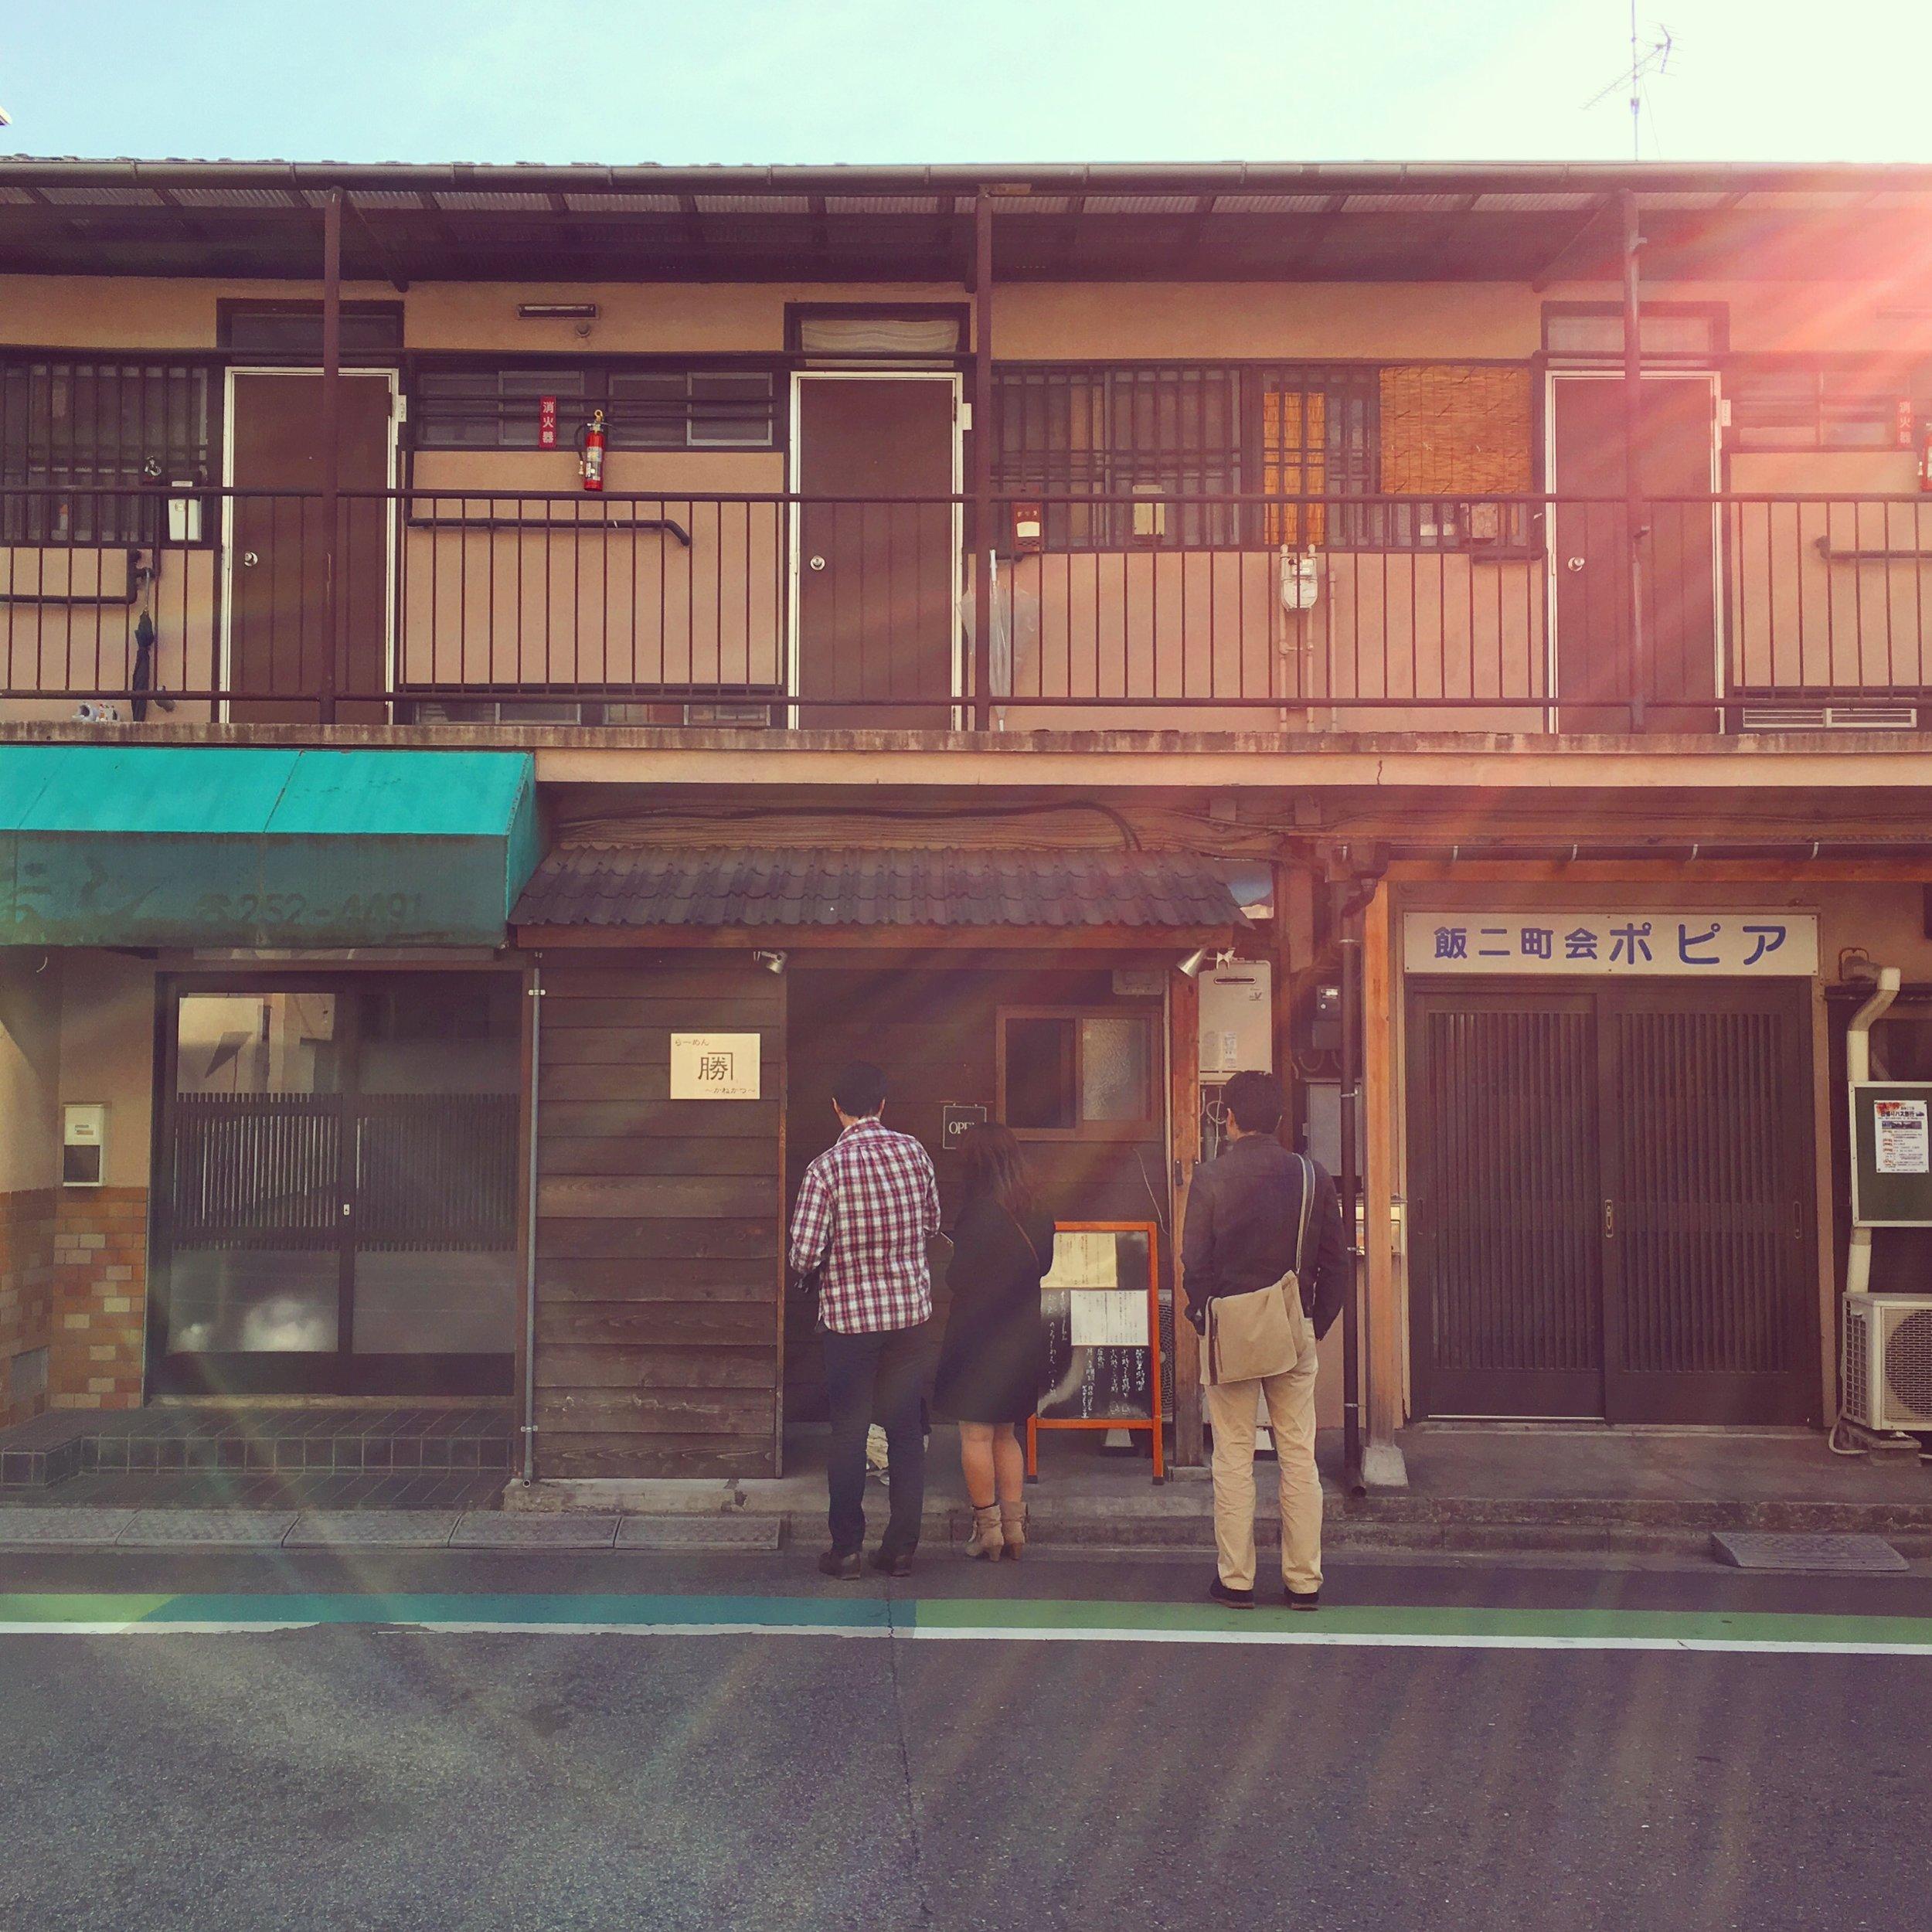 Kanekatsu Shop - Abram.jpg